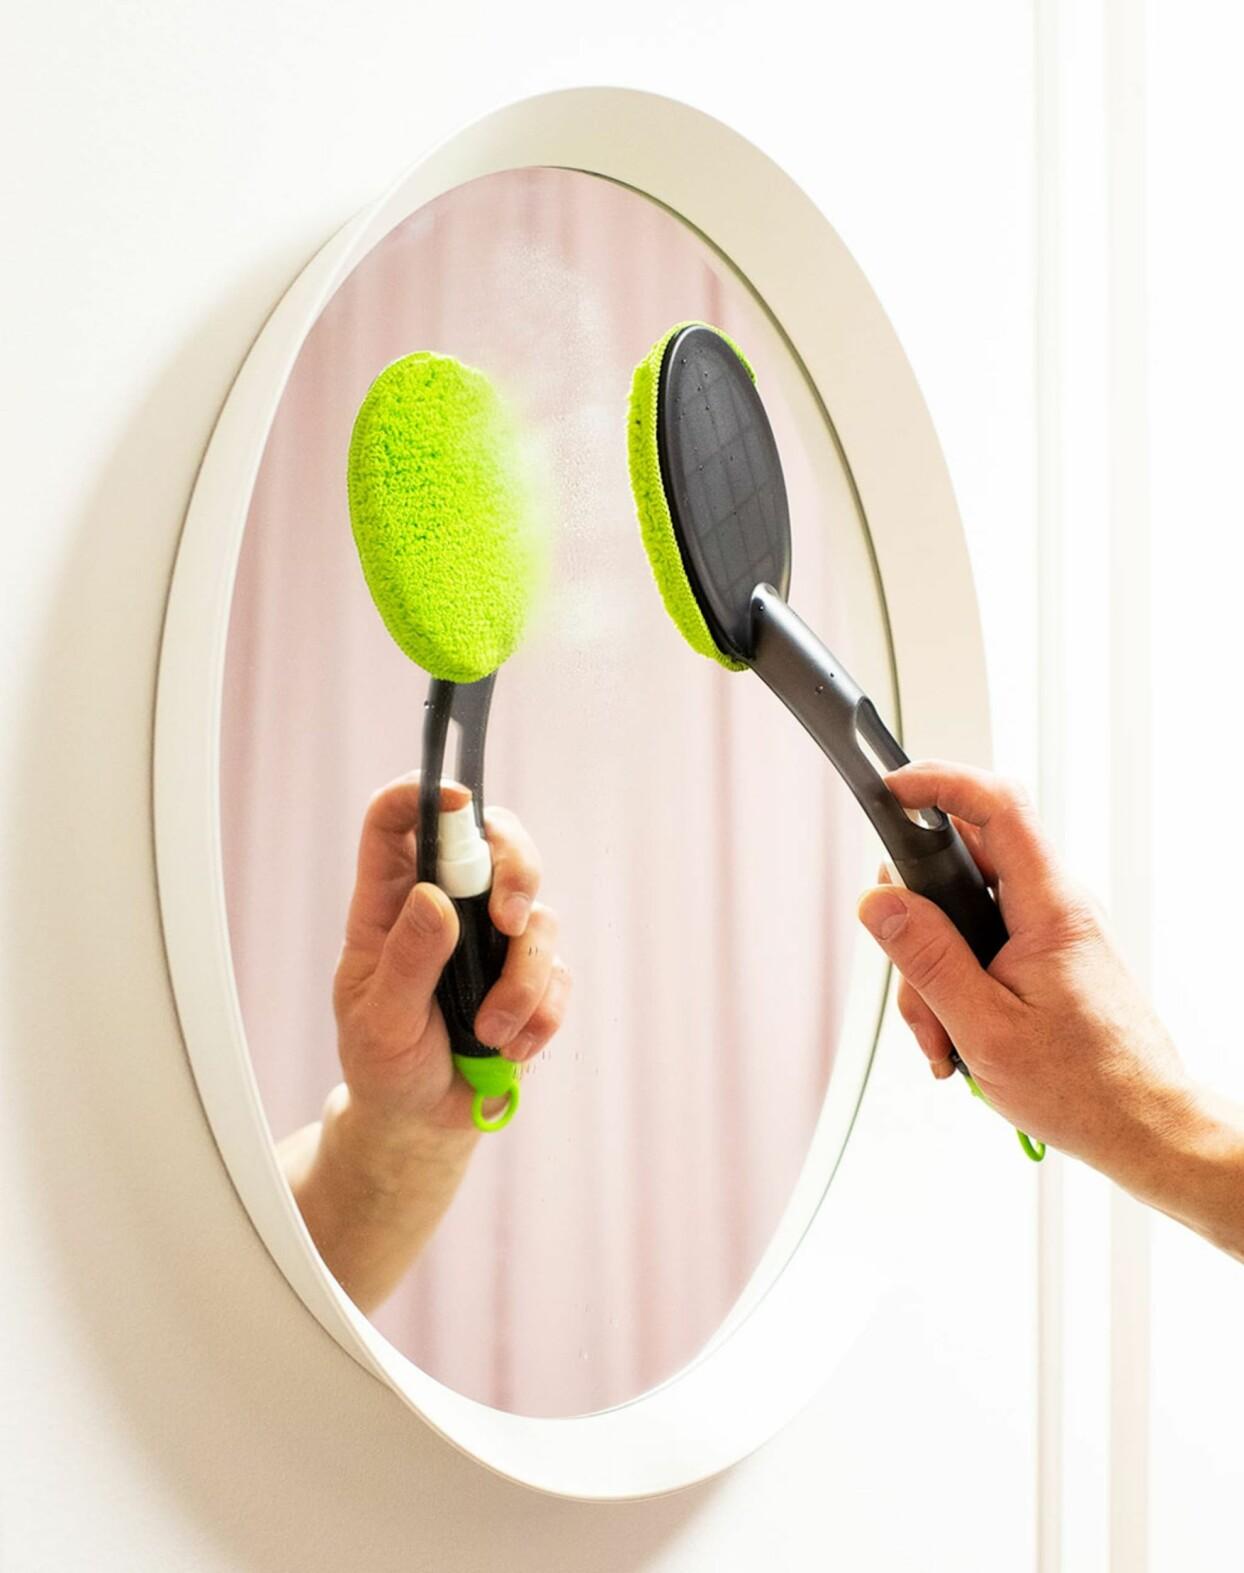 Spegel som putsas med microfiberverktyg.